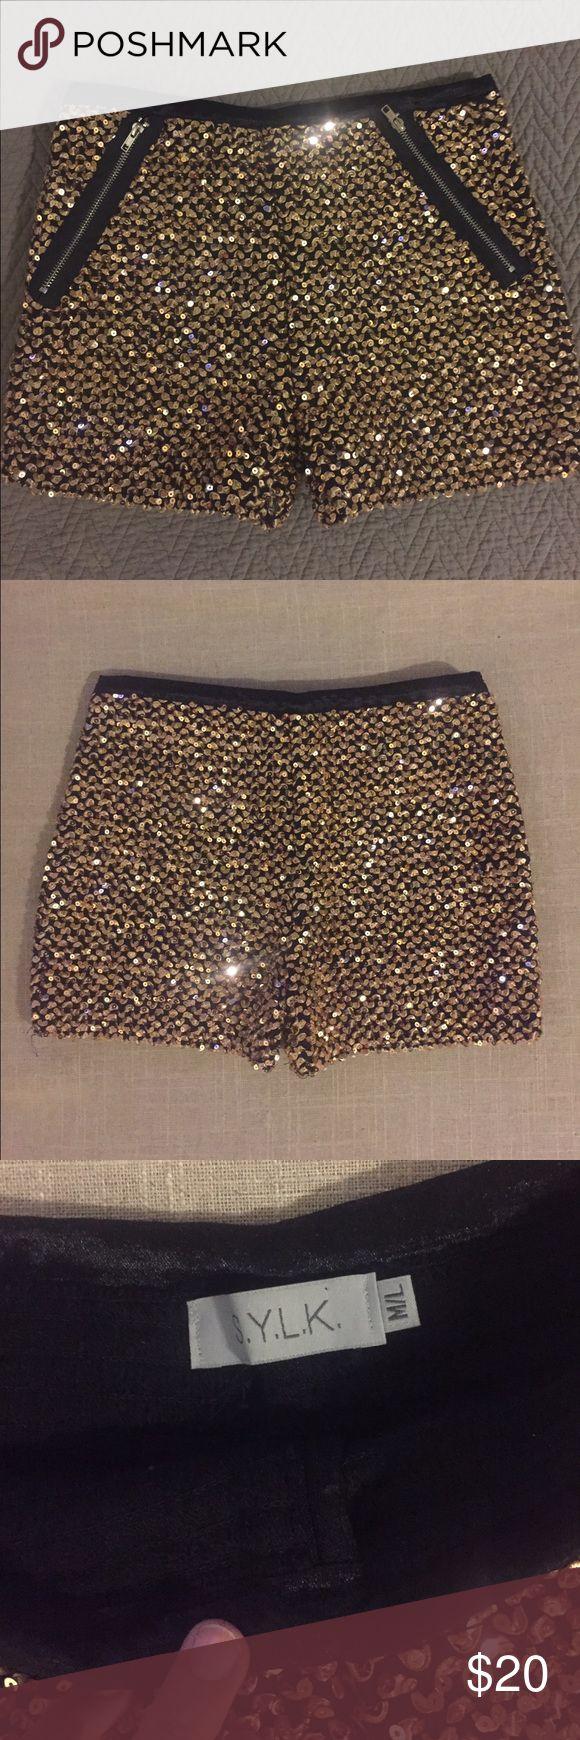 Gold sequin shorts gold sequin S.Y.L.K shorts. Size is M/L fits like S/M. Only worn once! S.Y.L.K Shorts